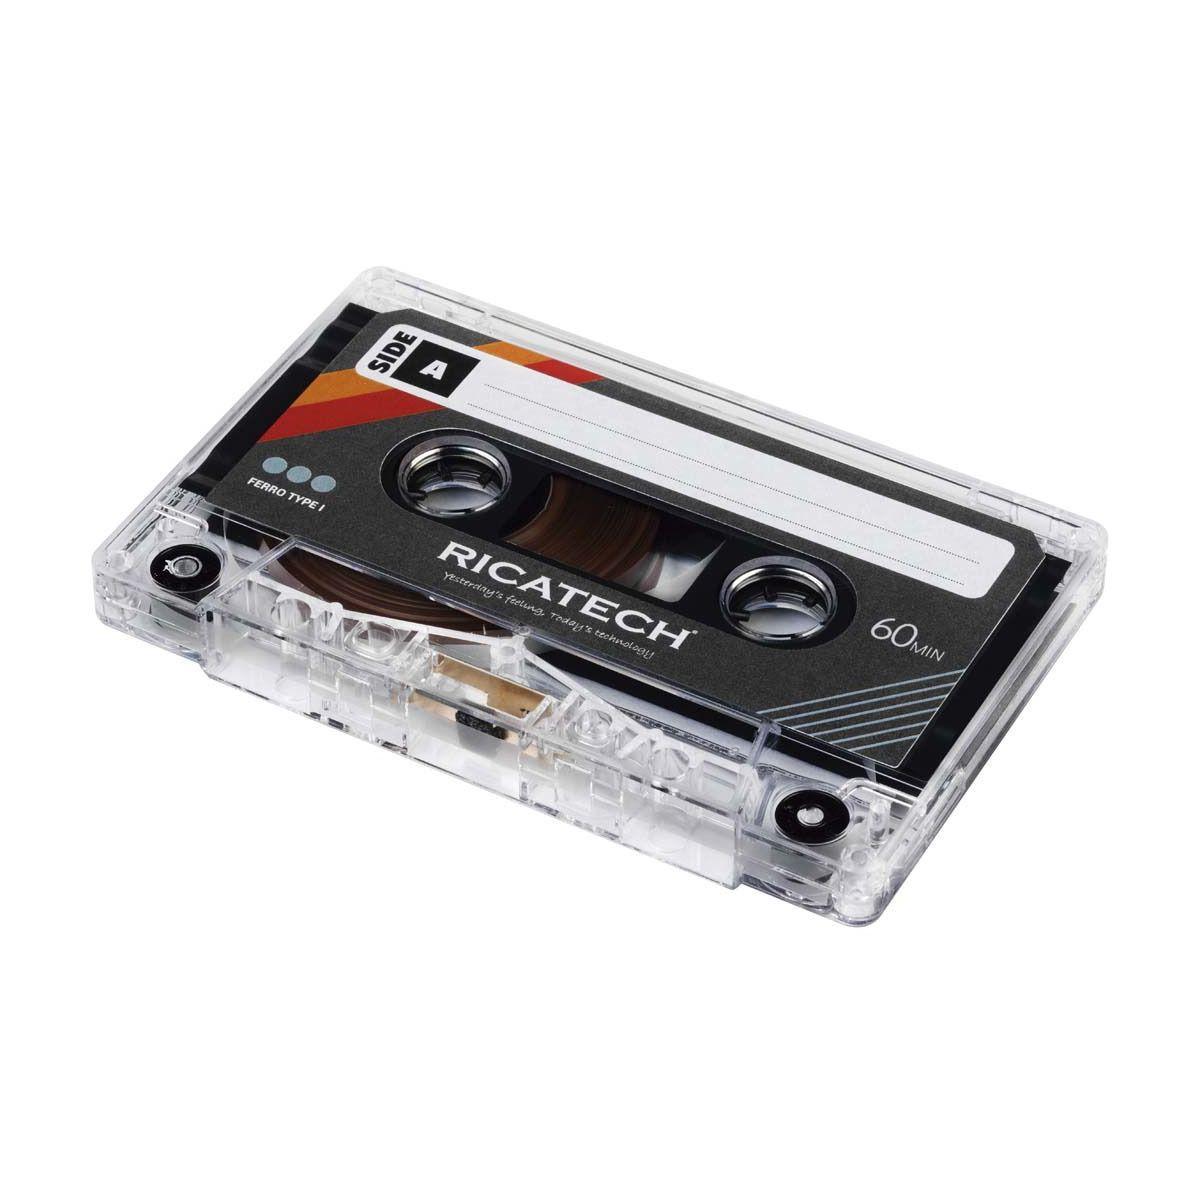 Cassette ricatech ct60 audio (photo)